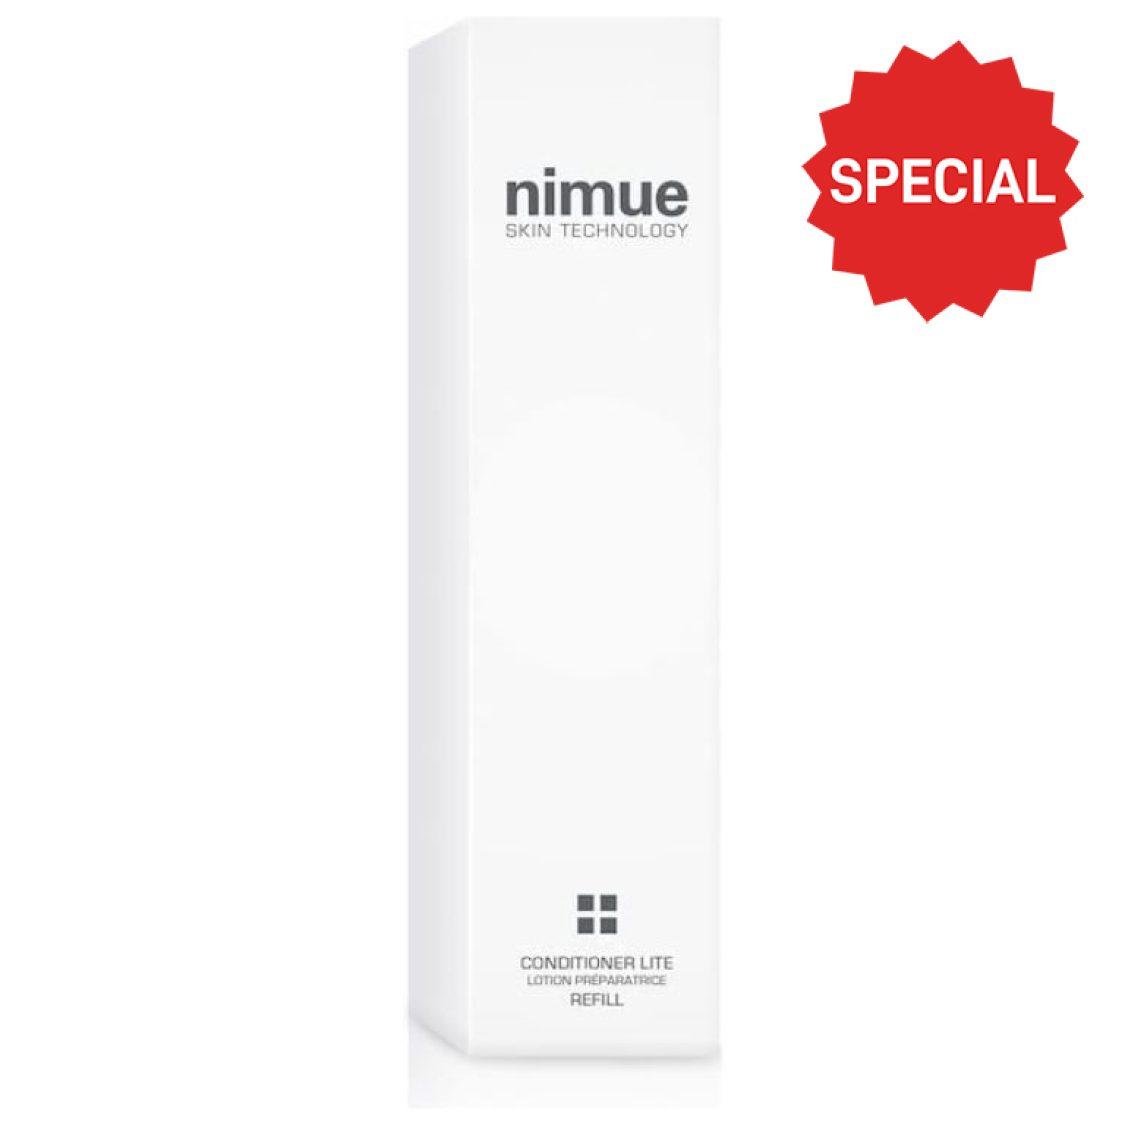 Nimue -  Conditioner Lite 140ml - Refill